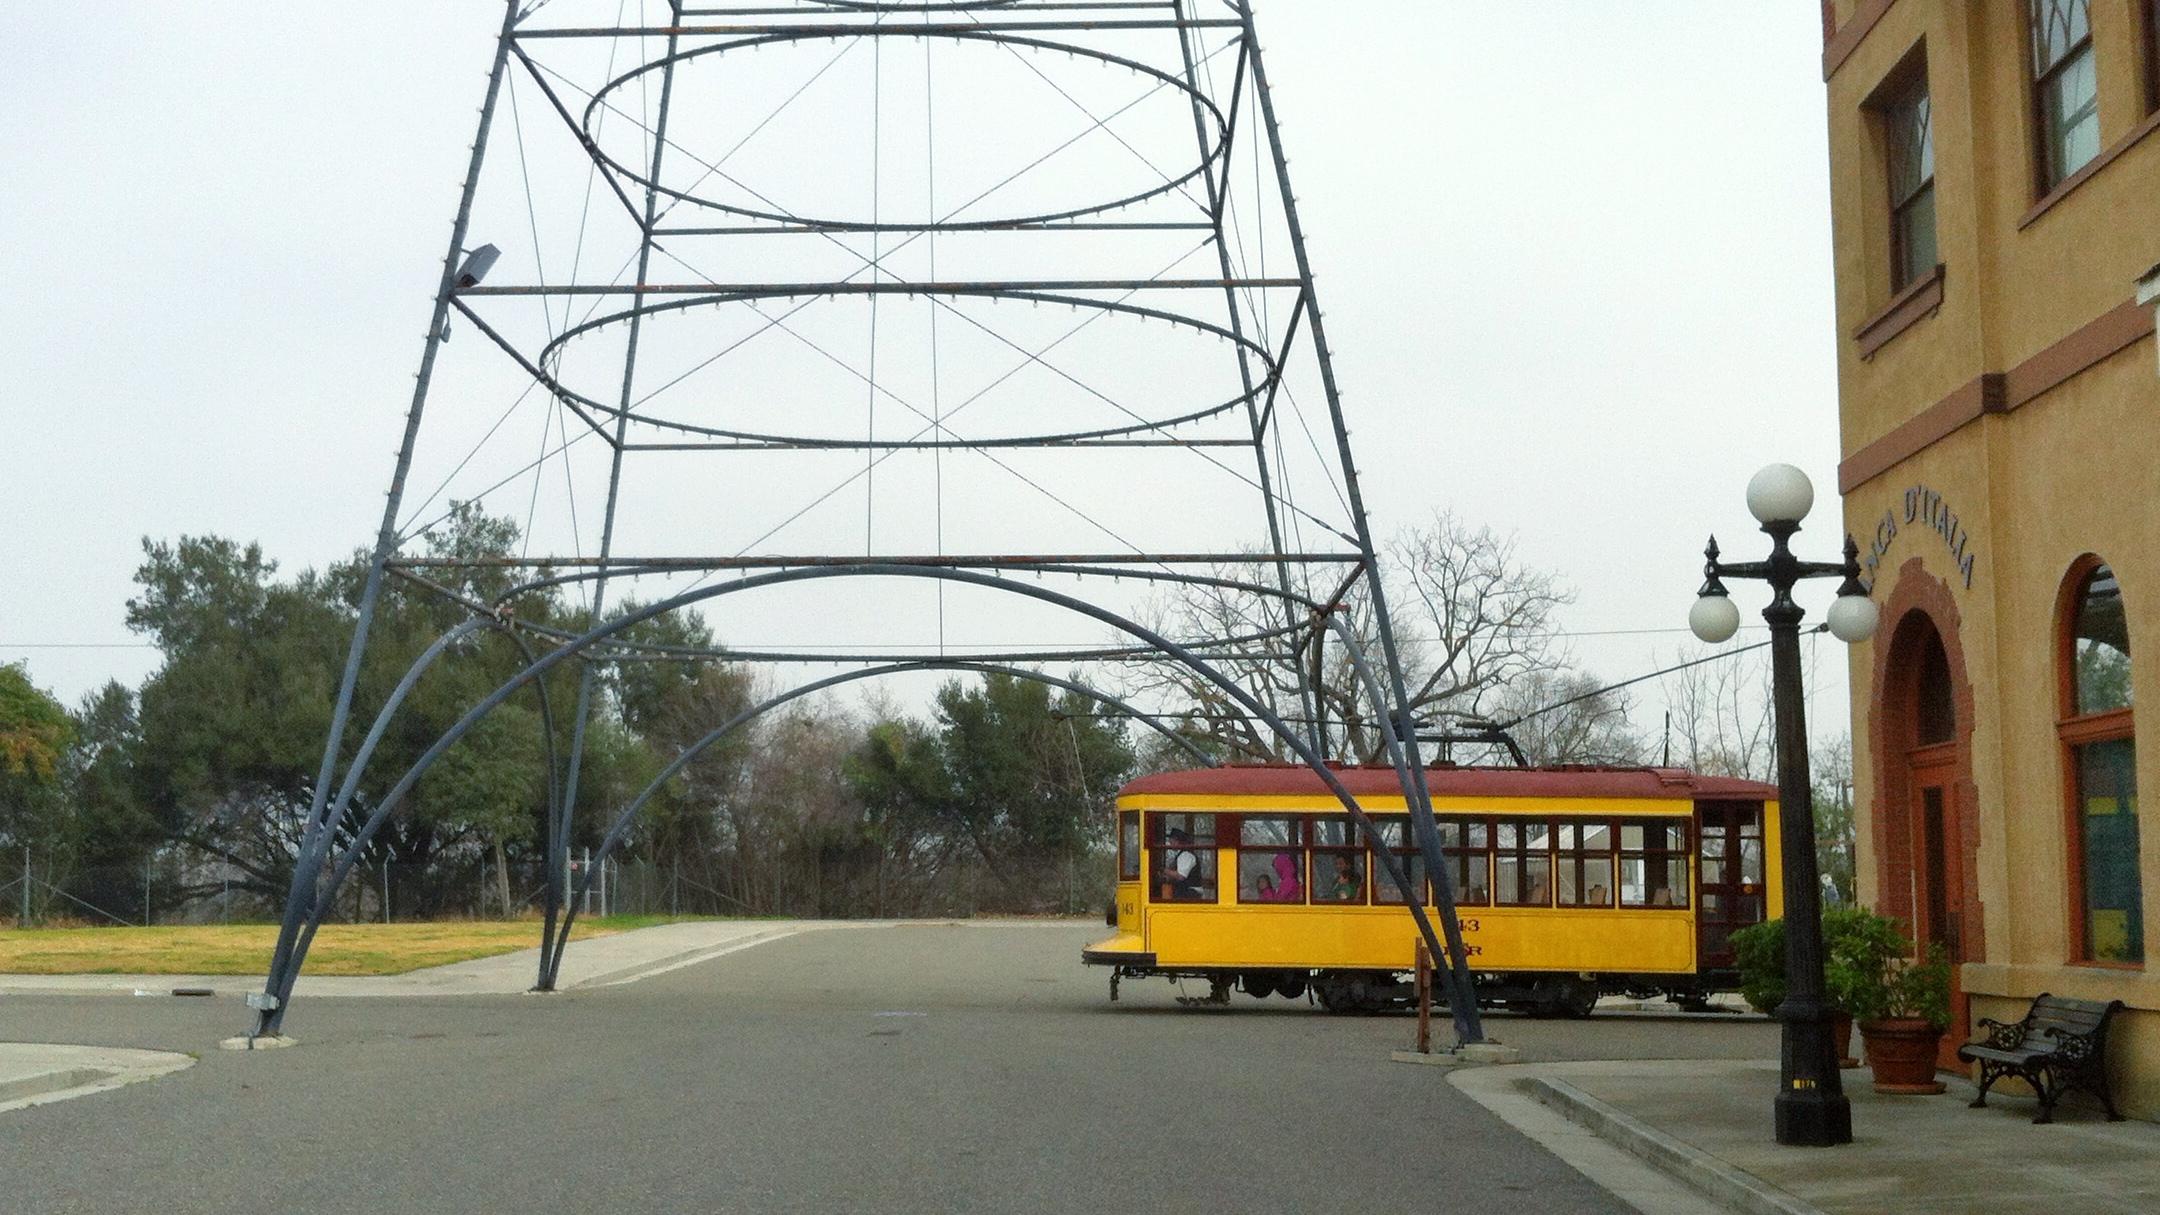 HistorySJ_trolleyAndLightTower.jpg